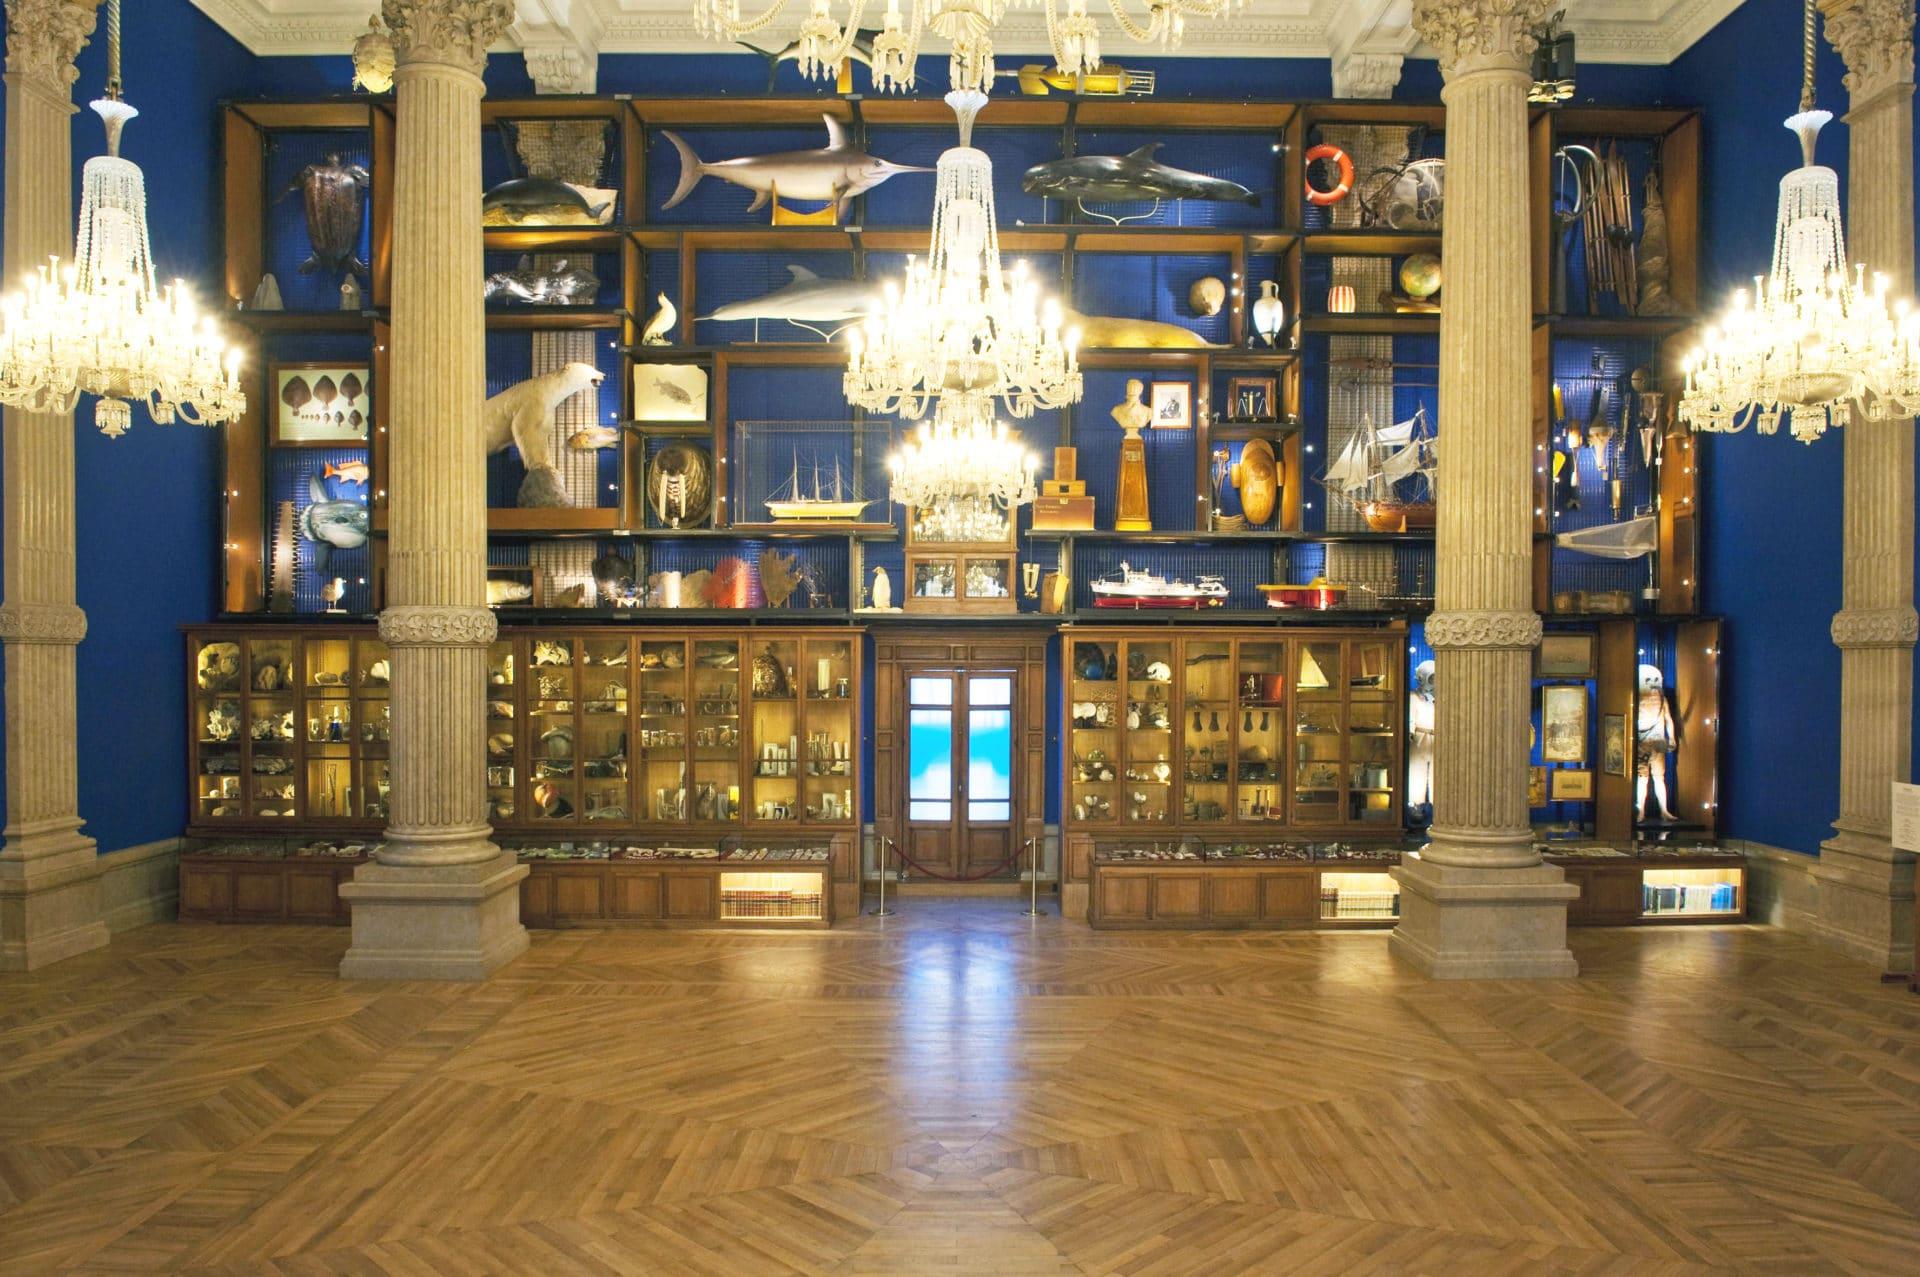 Cabinet Océanomania © M. Dagnino - Musée océanographique